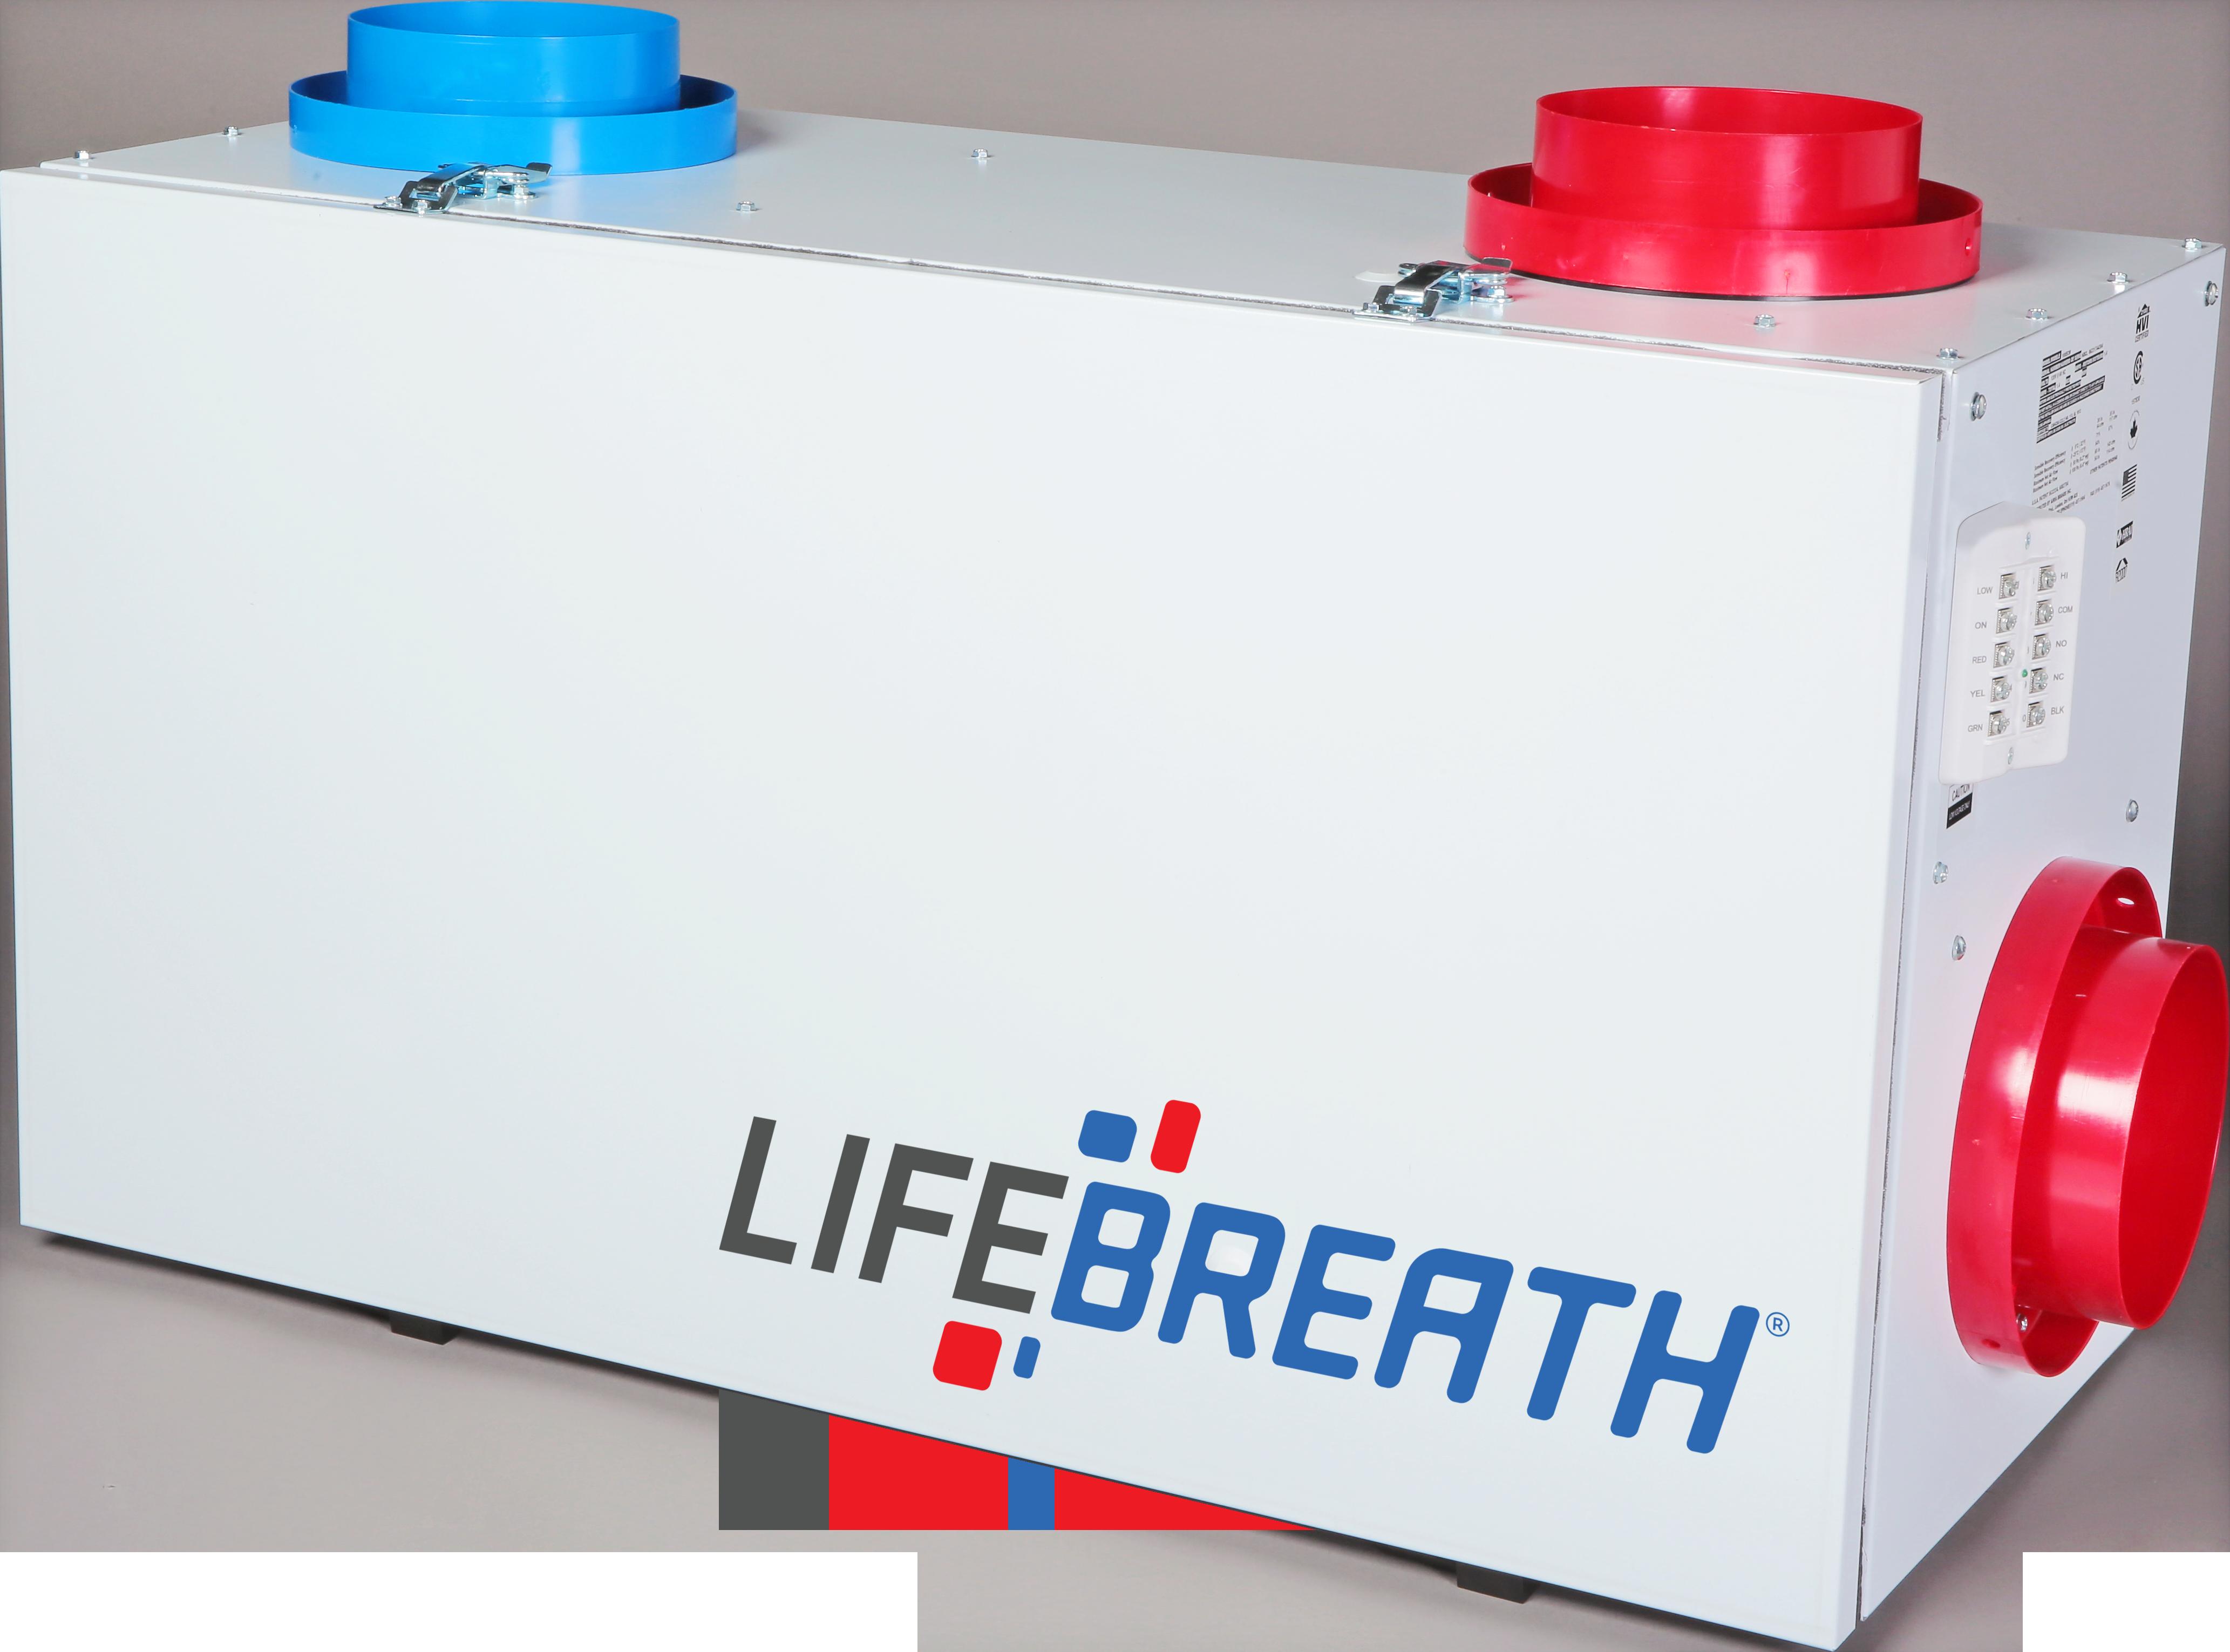 lifebreath 155 max residential heat recovery ventilator (hrv Water Heater Wiring Diagram lifebreath 155 max residential heat recovery ventilator (hrv) lifebreath